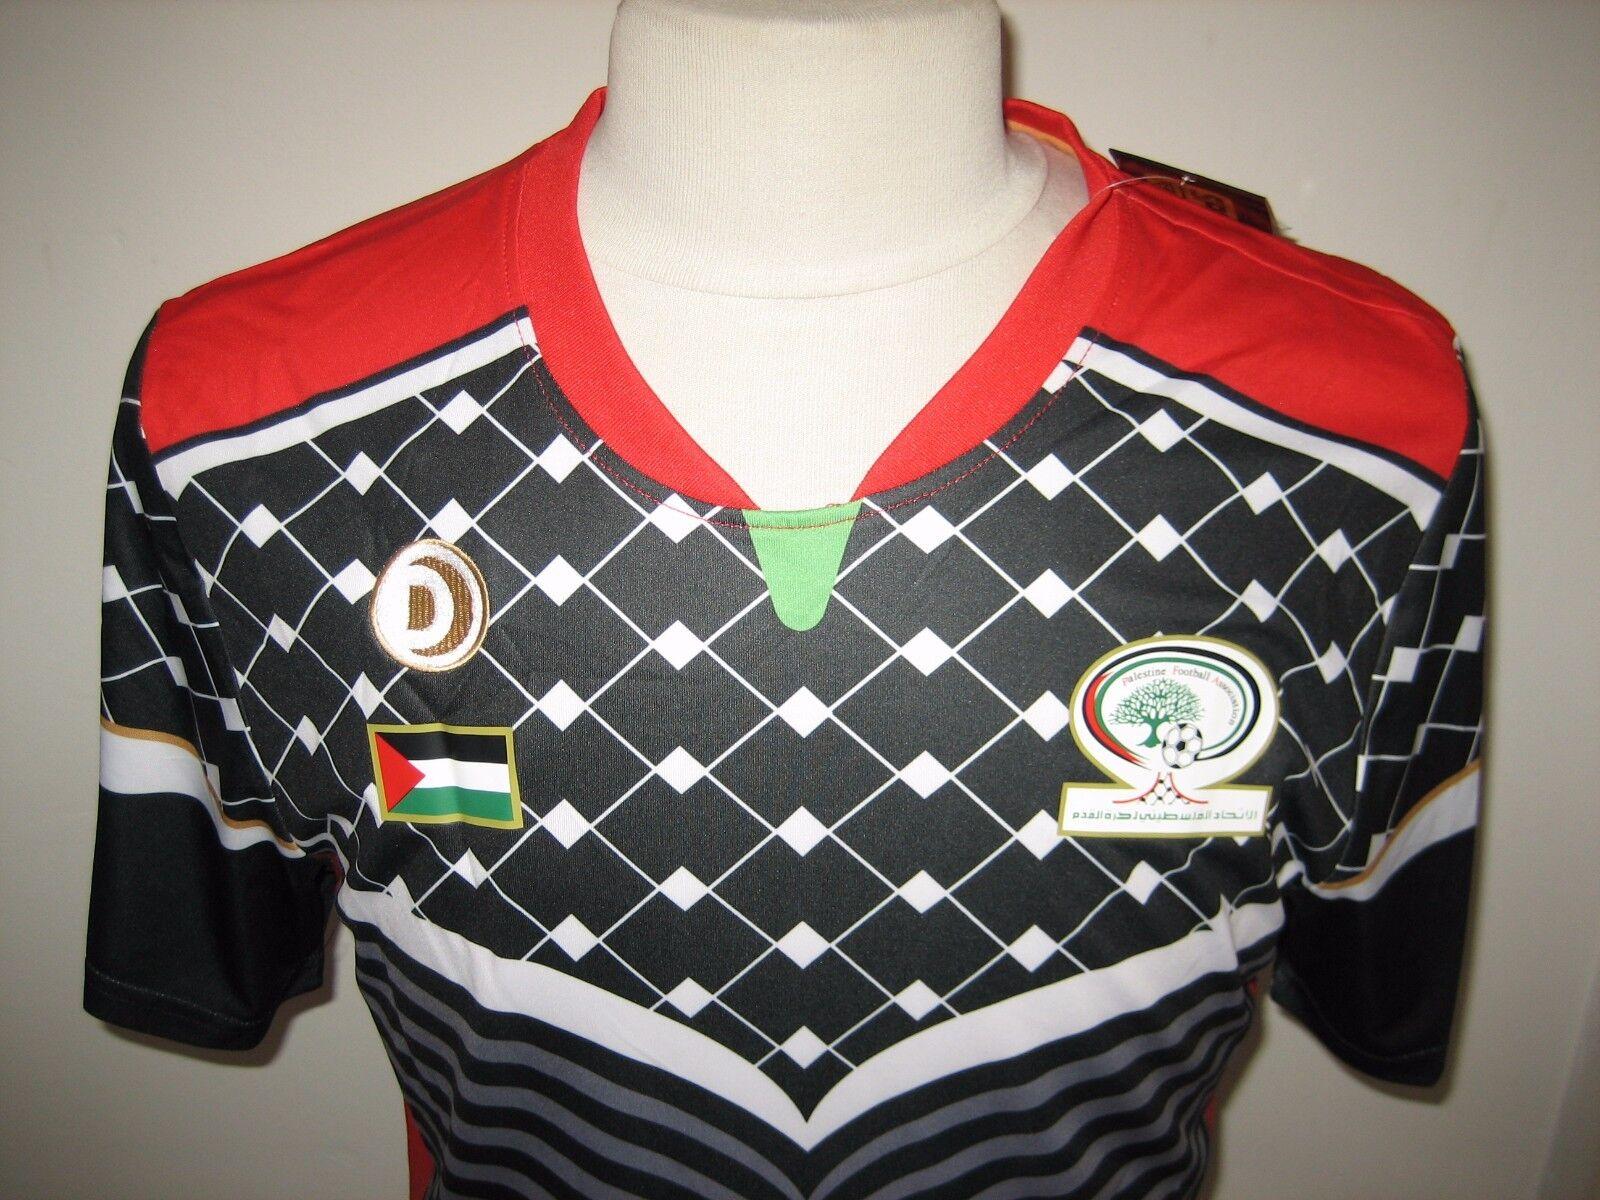 Palestine Palestine Palestine away rare football shirt soccer jersey maillot trikot camiseta Dimensione S 1c0a3e